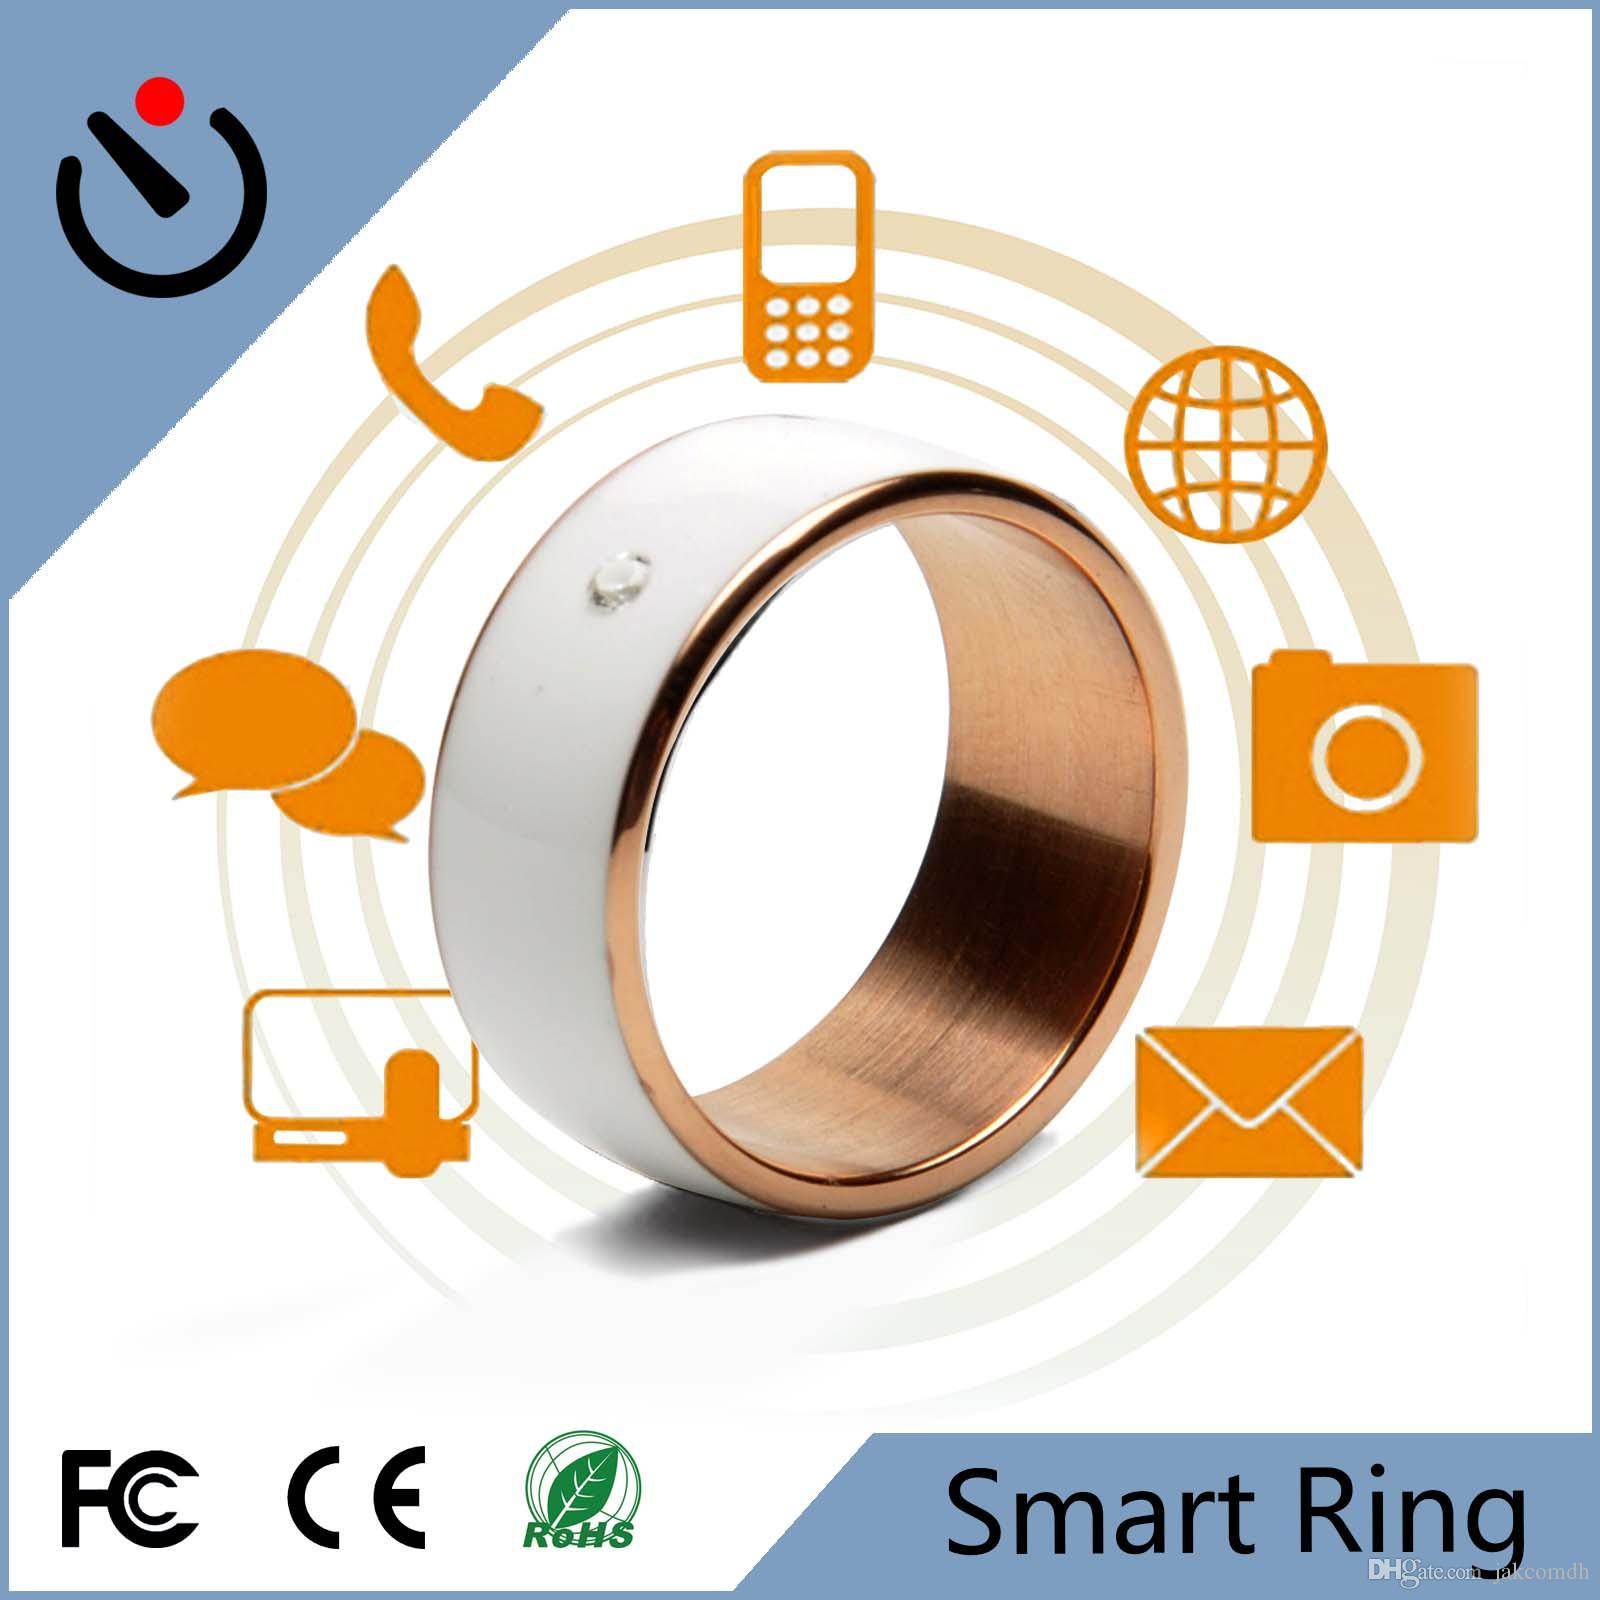 Smart Ring Nfc Android Wp Smart Electronics Dispositivi intelligenti Magia intelligente Vendita calda come mobile Camara Detector Mp3